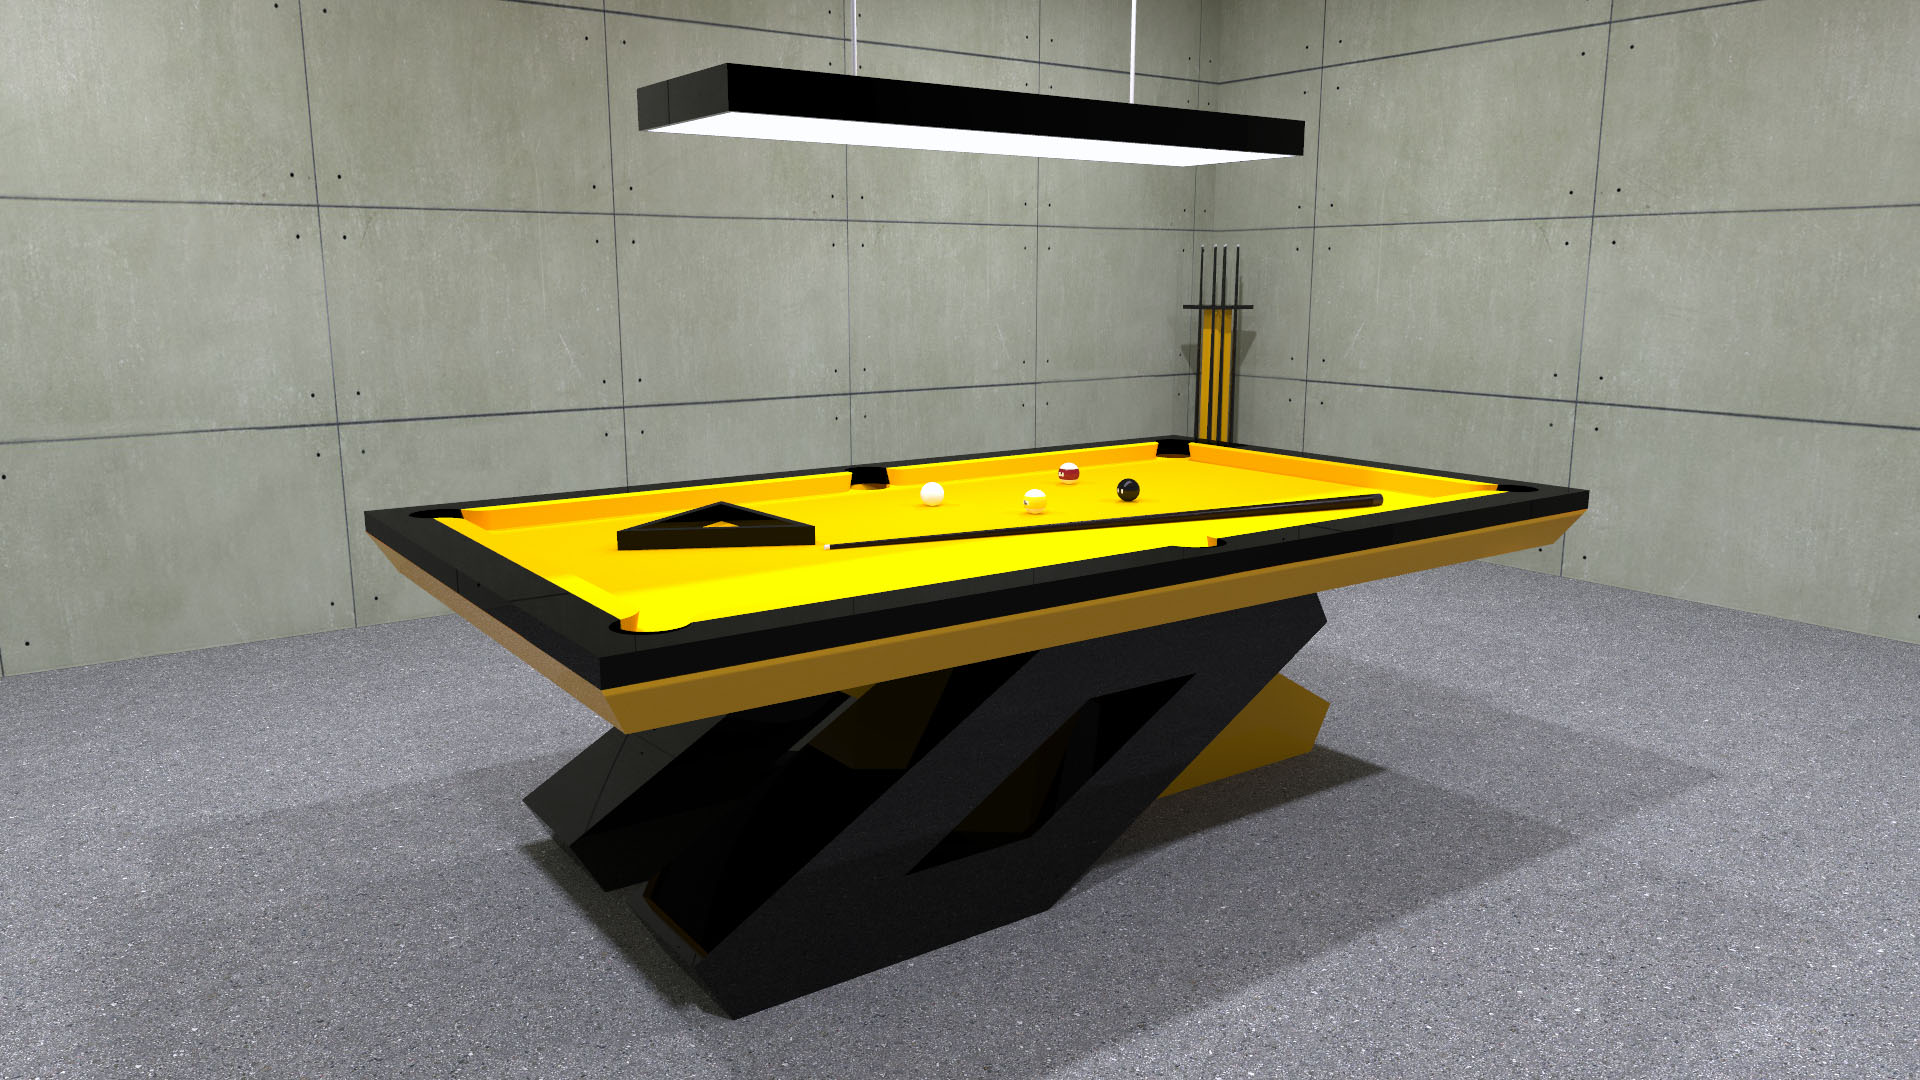 Dozer amarelo esquerda.jpg